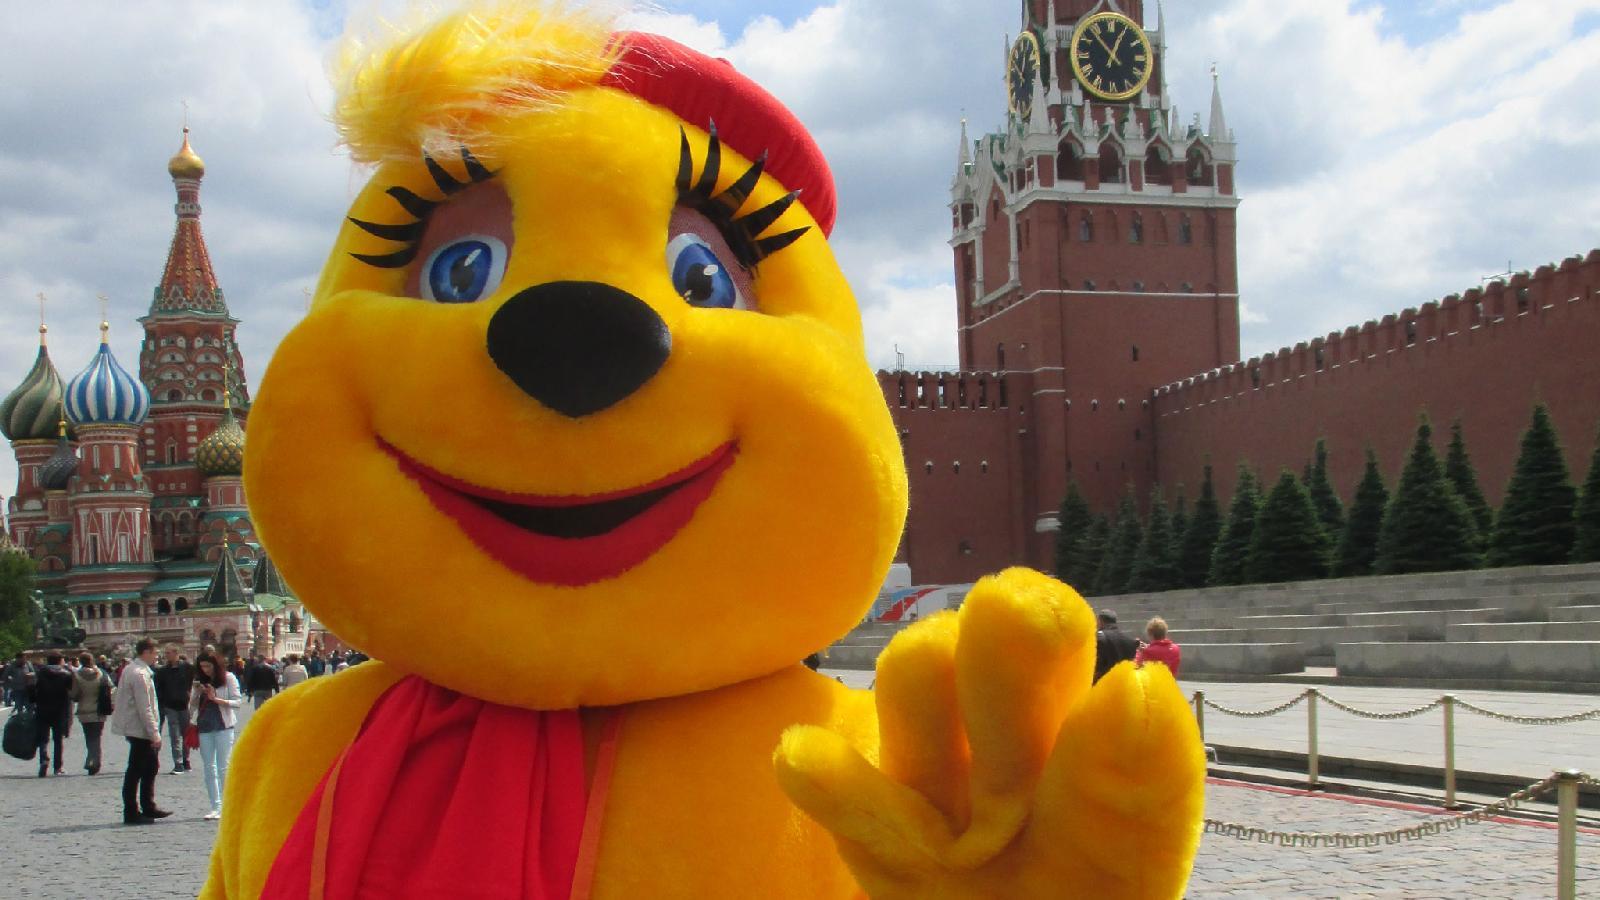 «Мурзилка» на книжном фестивале «Красная площадь». Москва. 4 июня 2017 года